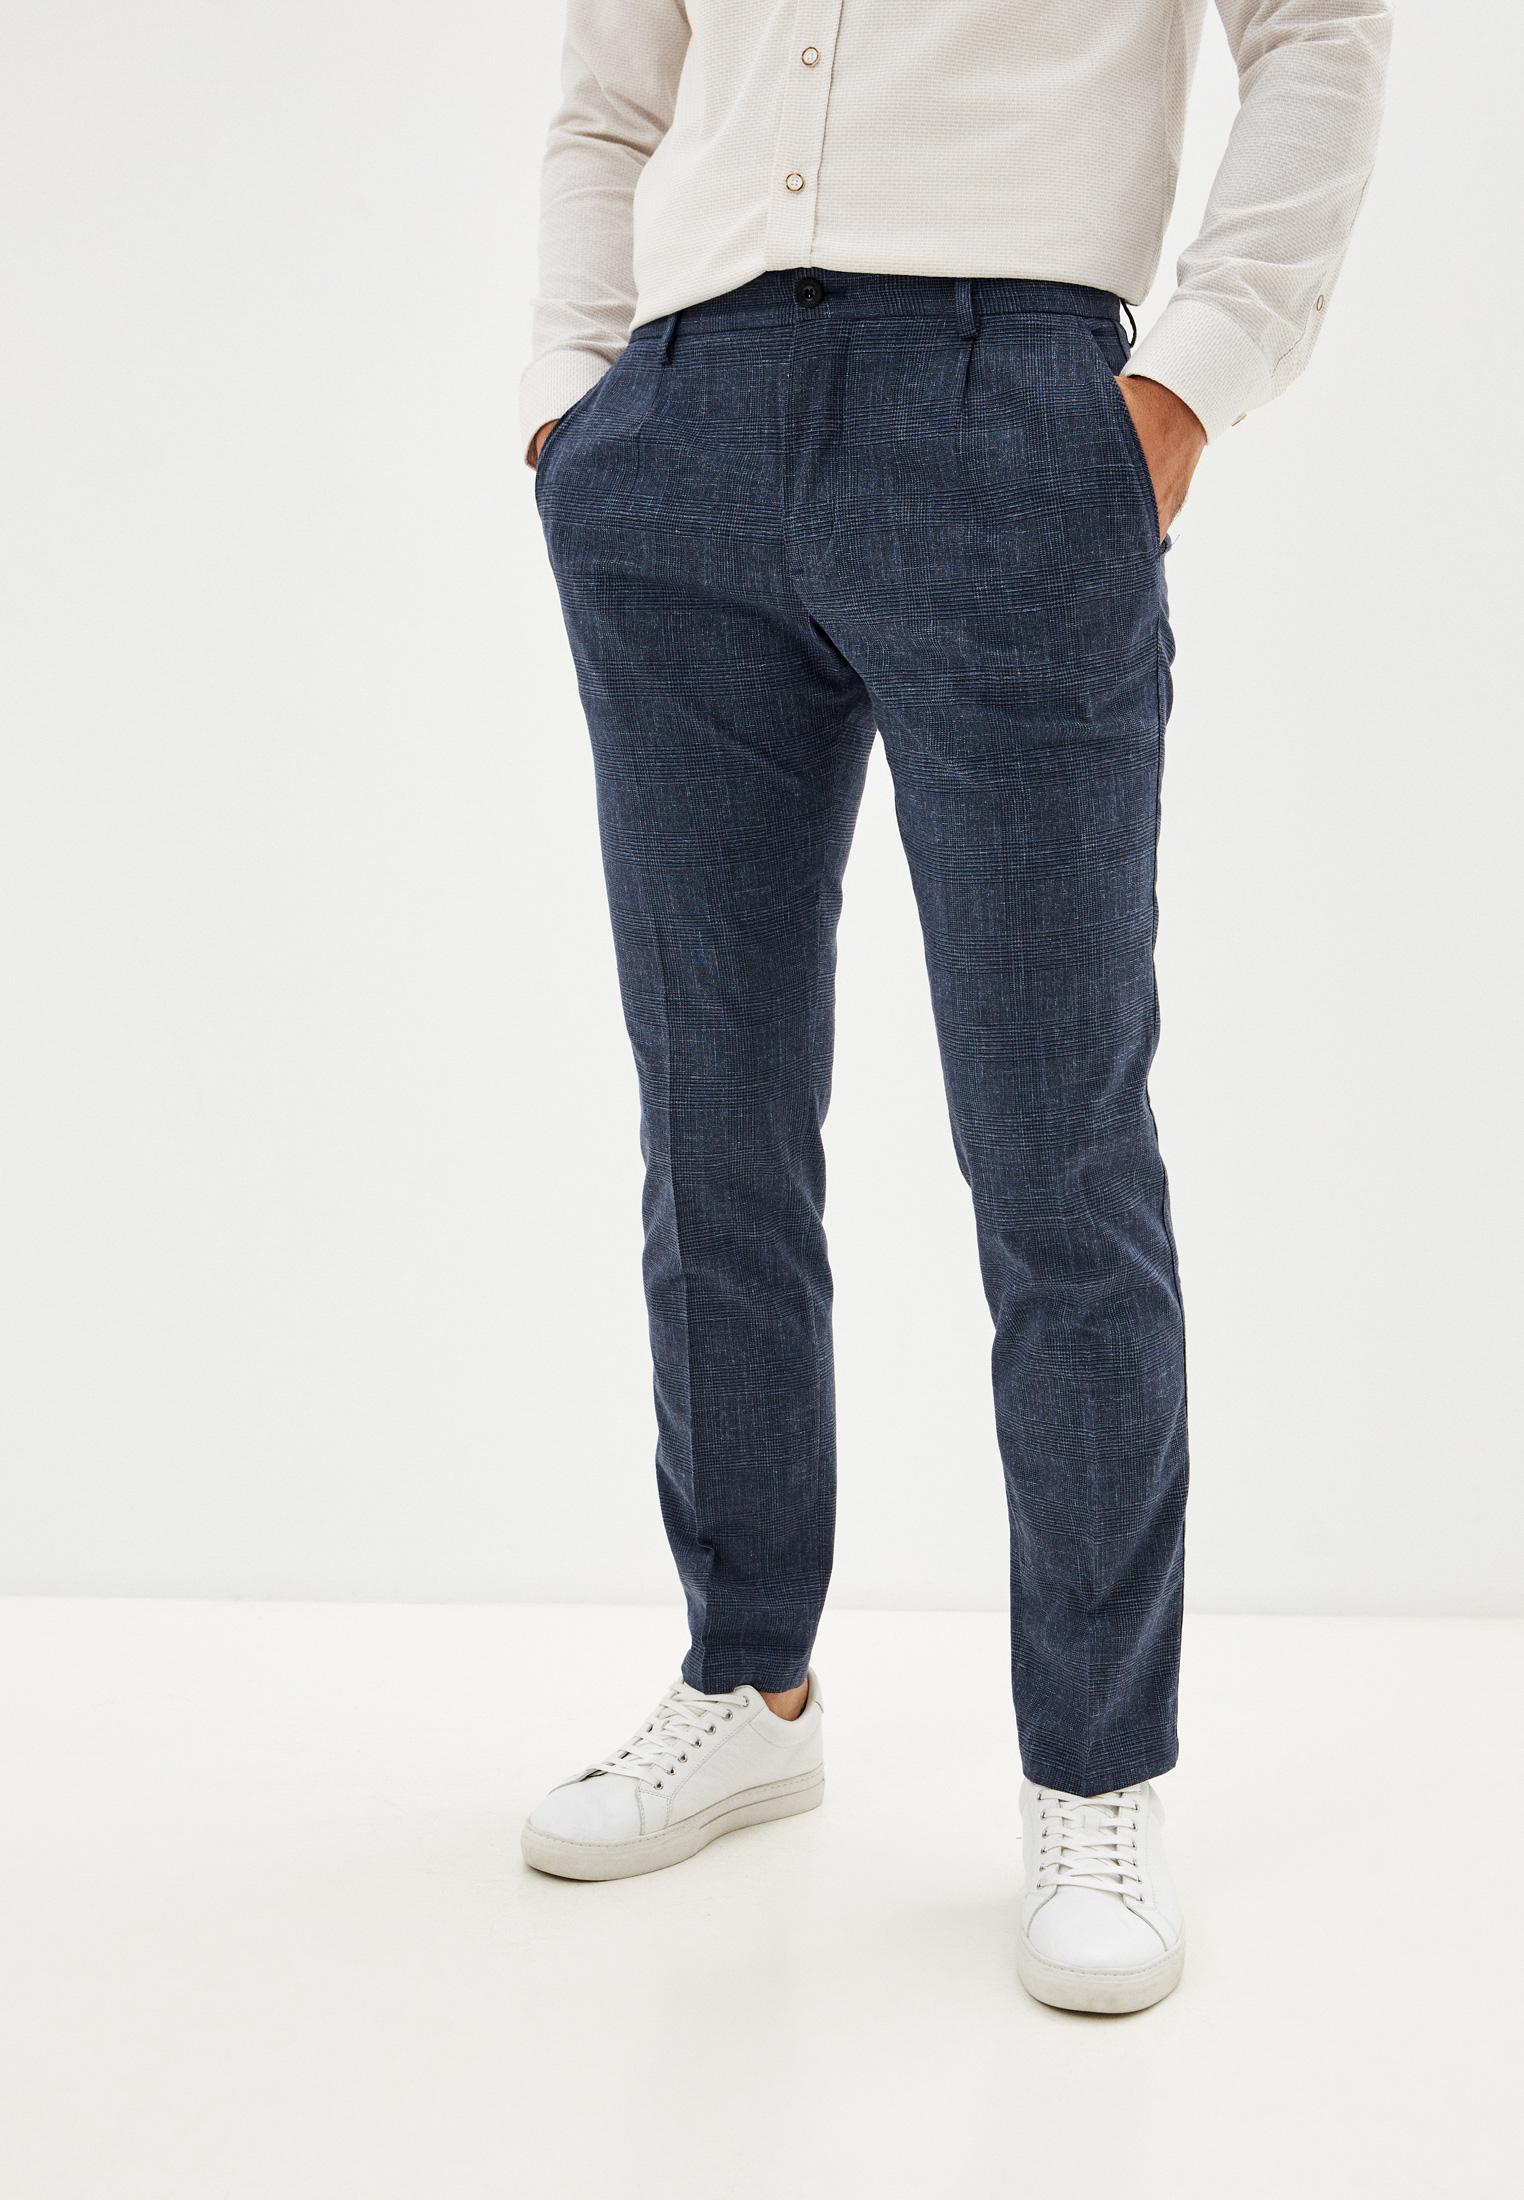 Мужские классические брюки Tommy Hilfiger (Томми Хилфигер) Брюки Tommy Hilfiger